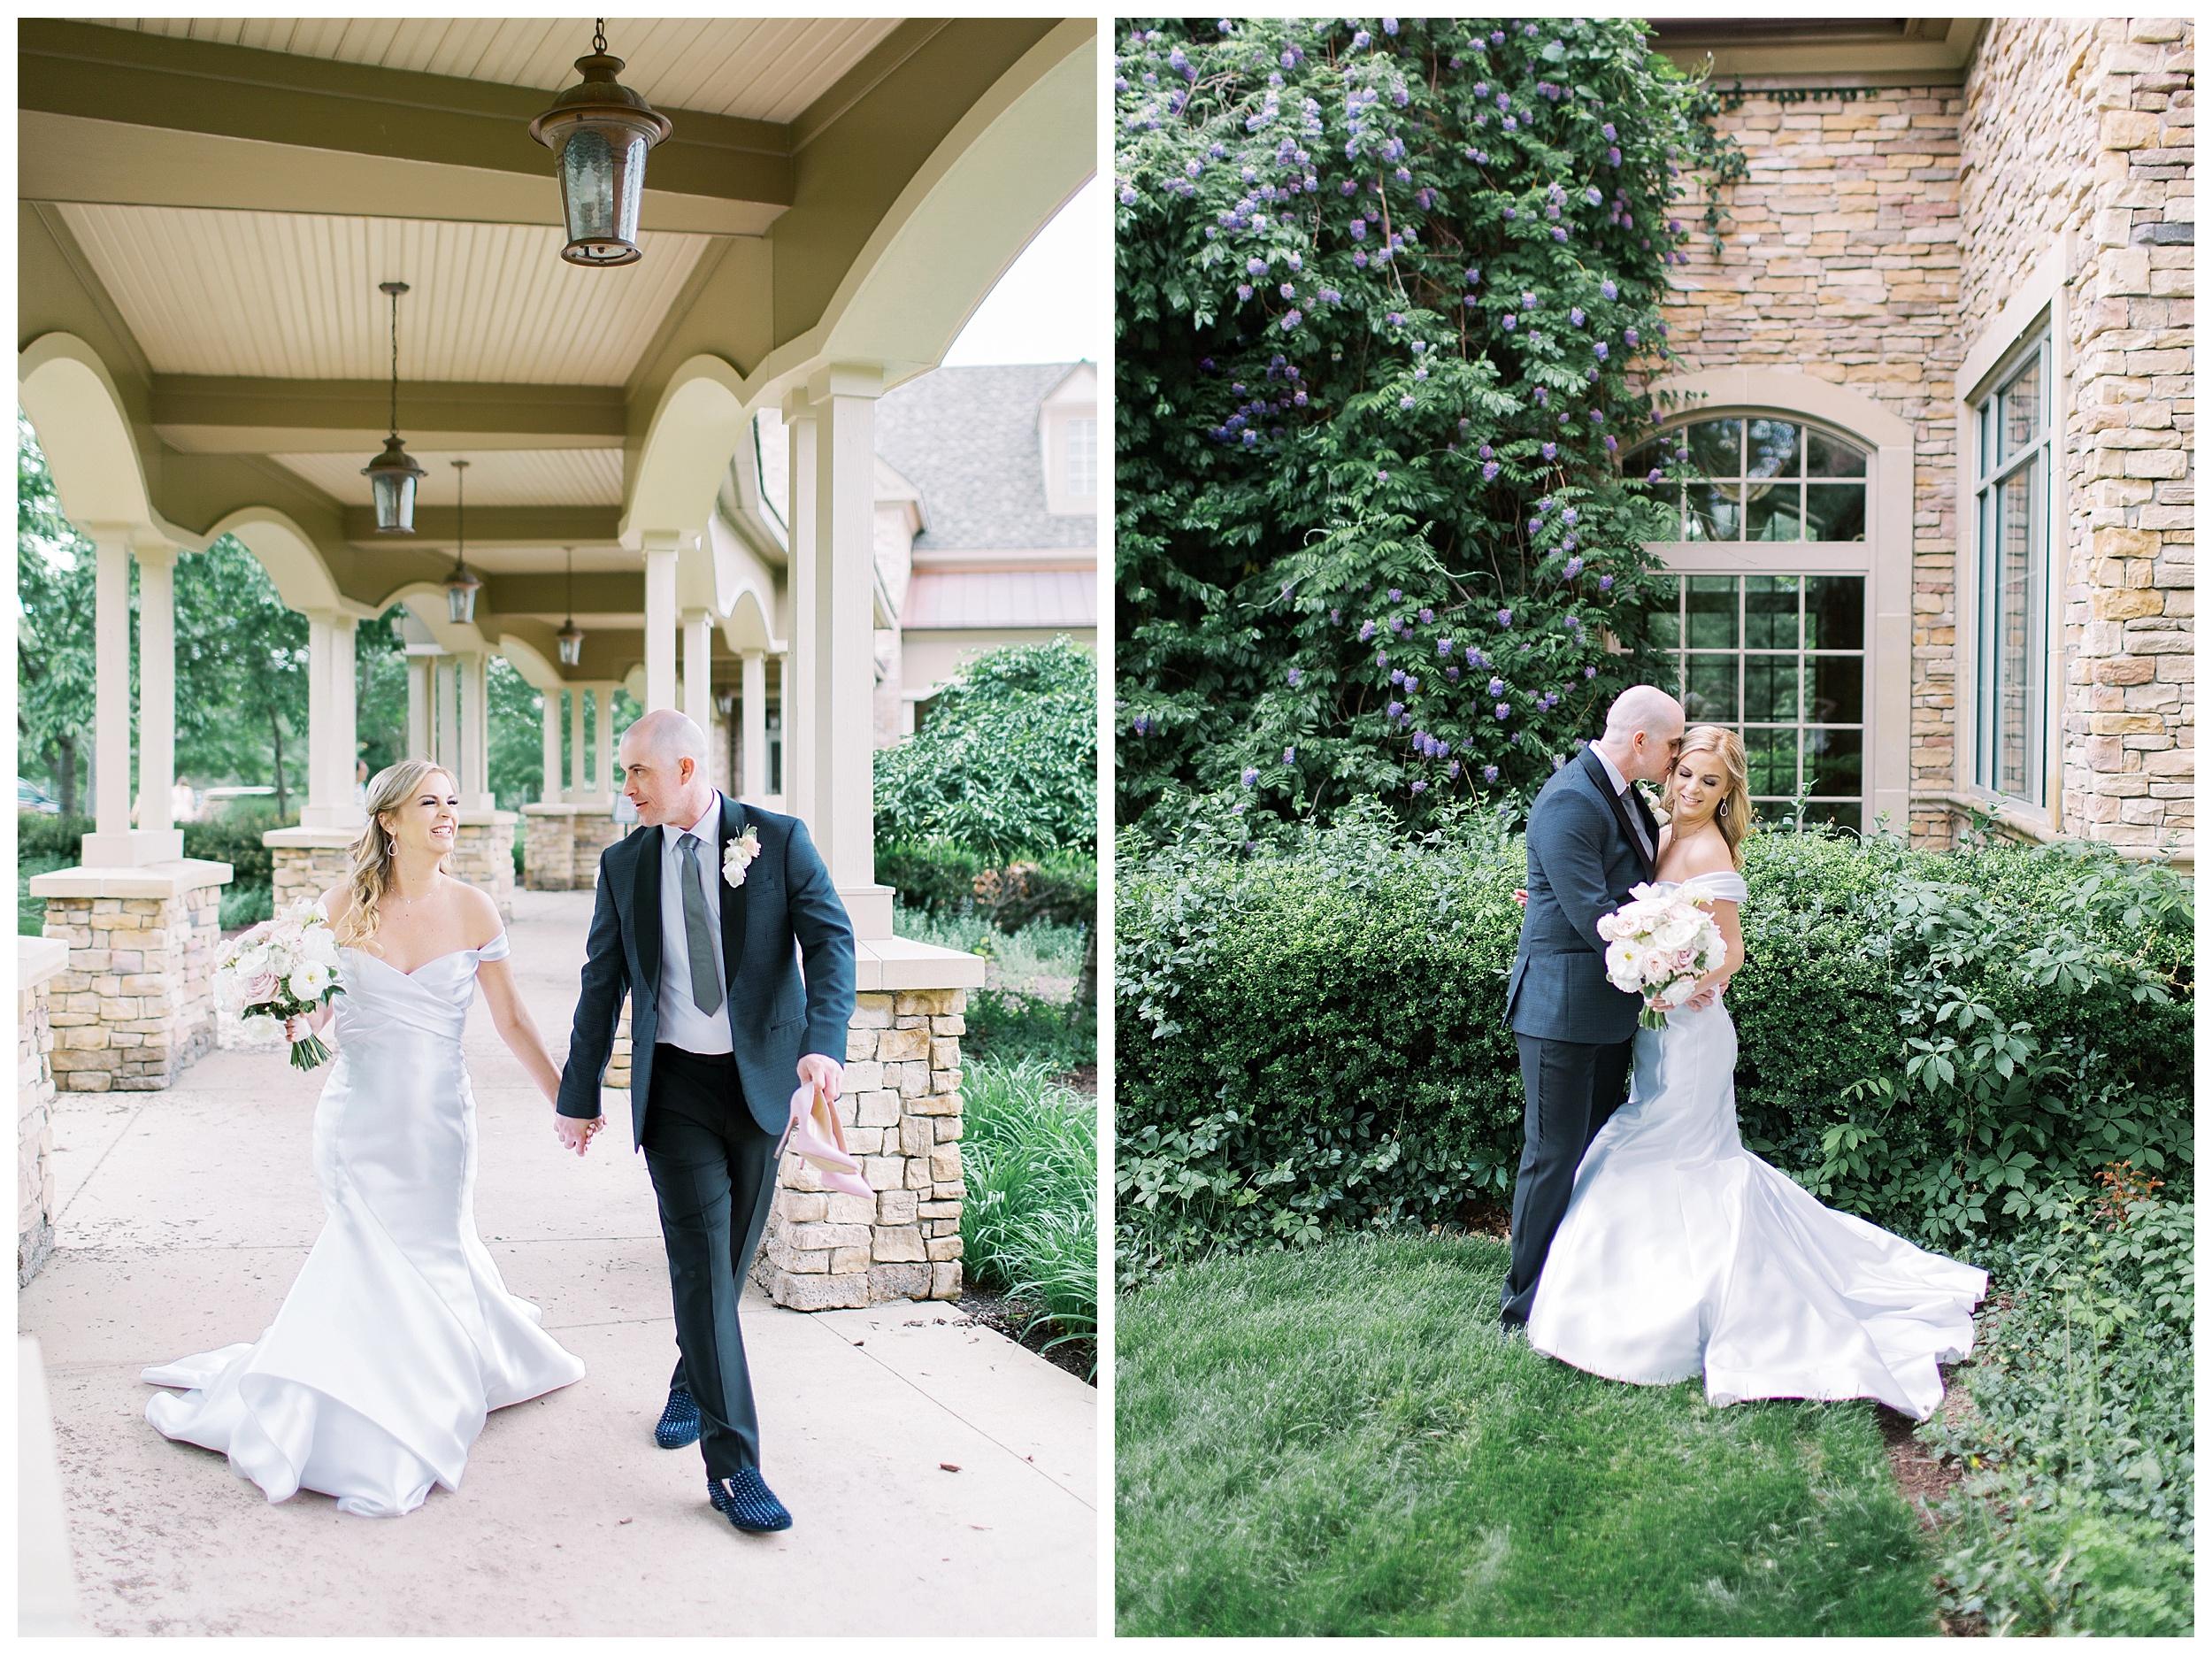 Lansdowne Resort Wedding | Virginia Film Wedding Photographer Kir Tuben_0048.jpg